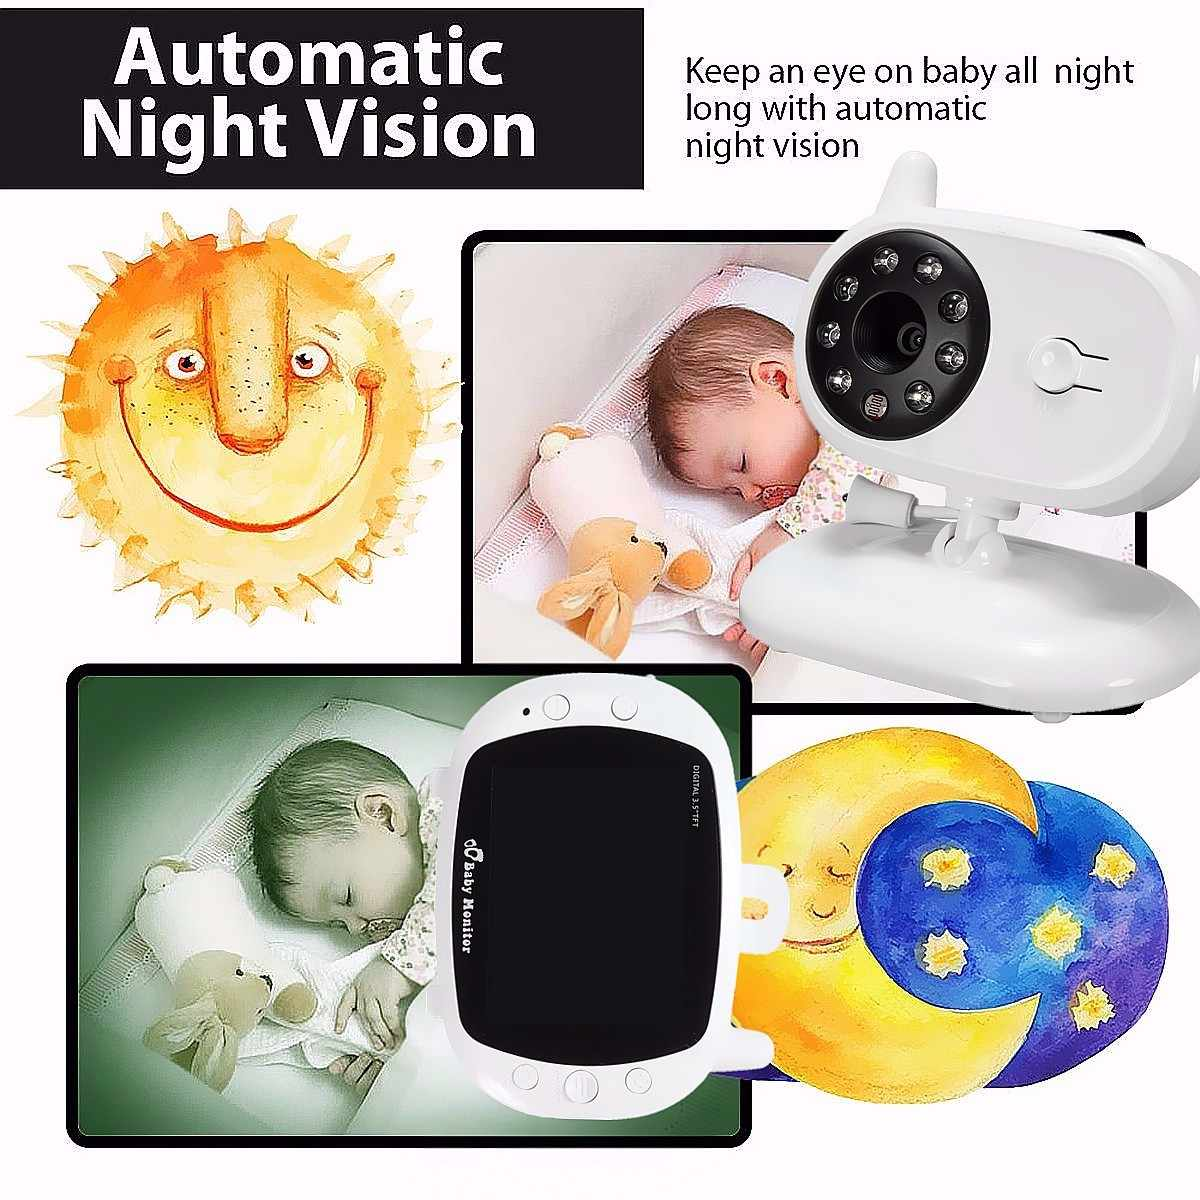 3.5 ''LCD الرقمية مراقبة الطفل 2 طريقة الصوت كاميرا فيديو لاسلكية للرؤية الليلية سلامة المنزل مراقبة الطفل جليسة الأطفال